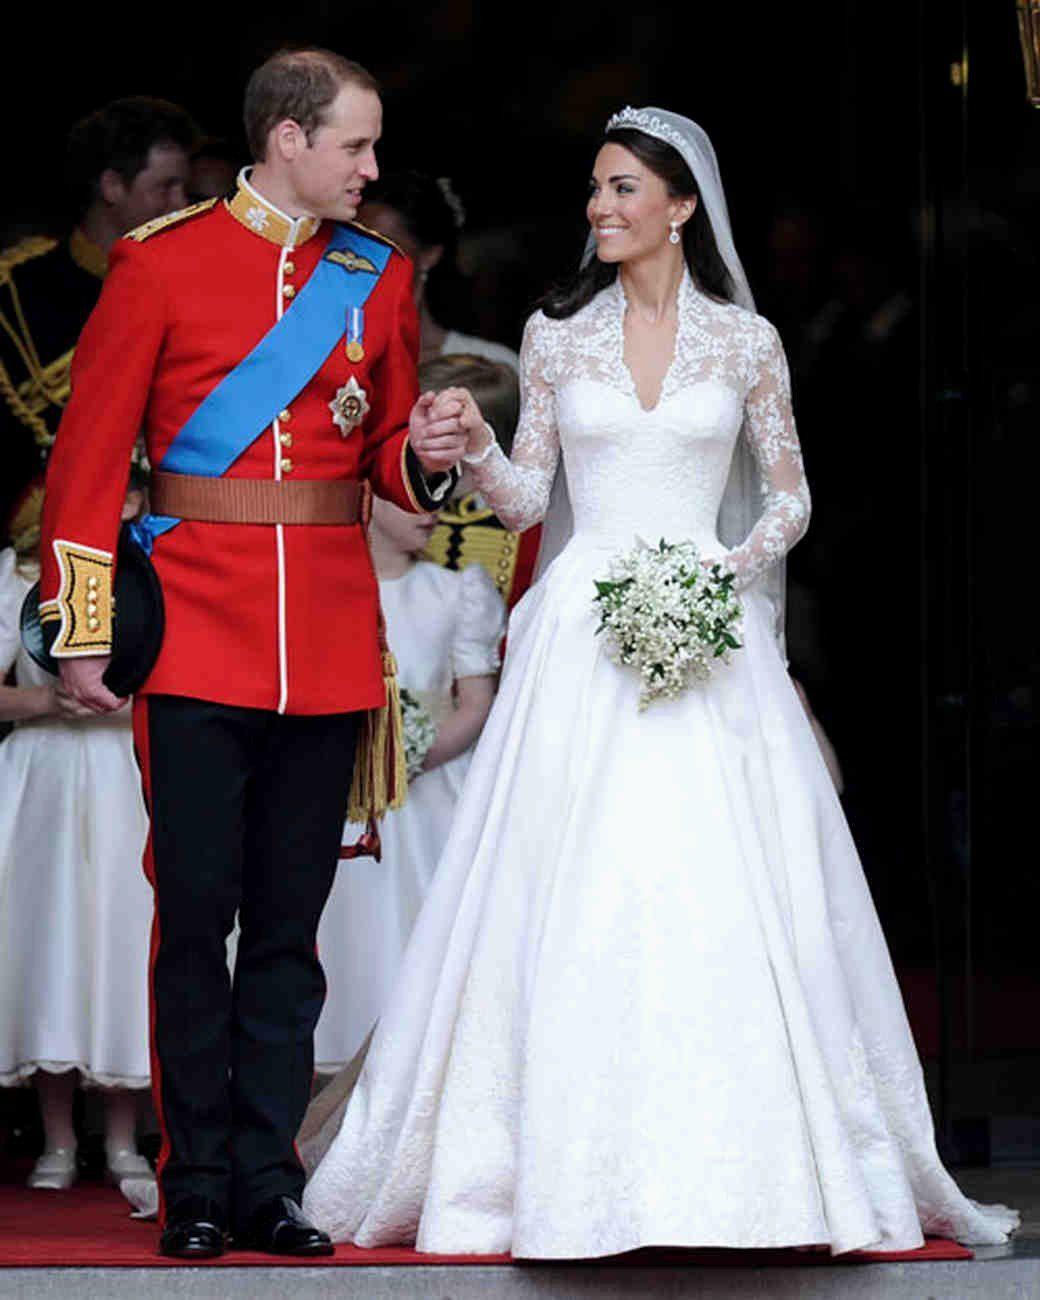 Kate Middleton Wedding Dress Replica Unique Wedding Dress